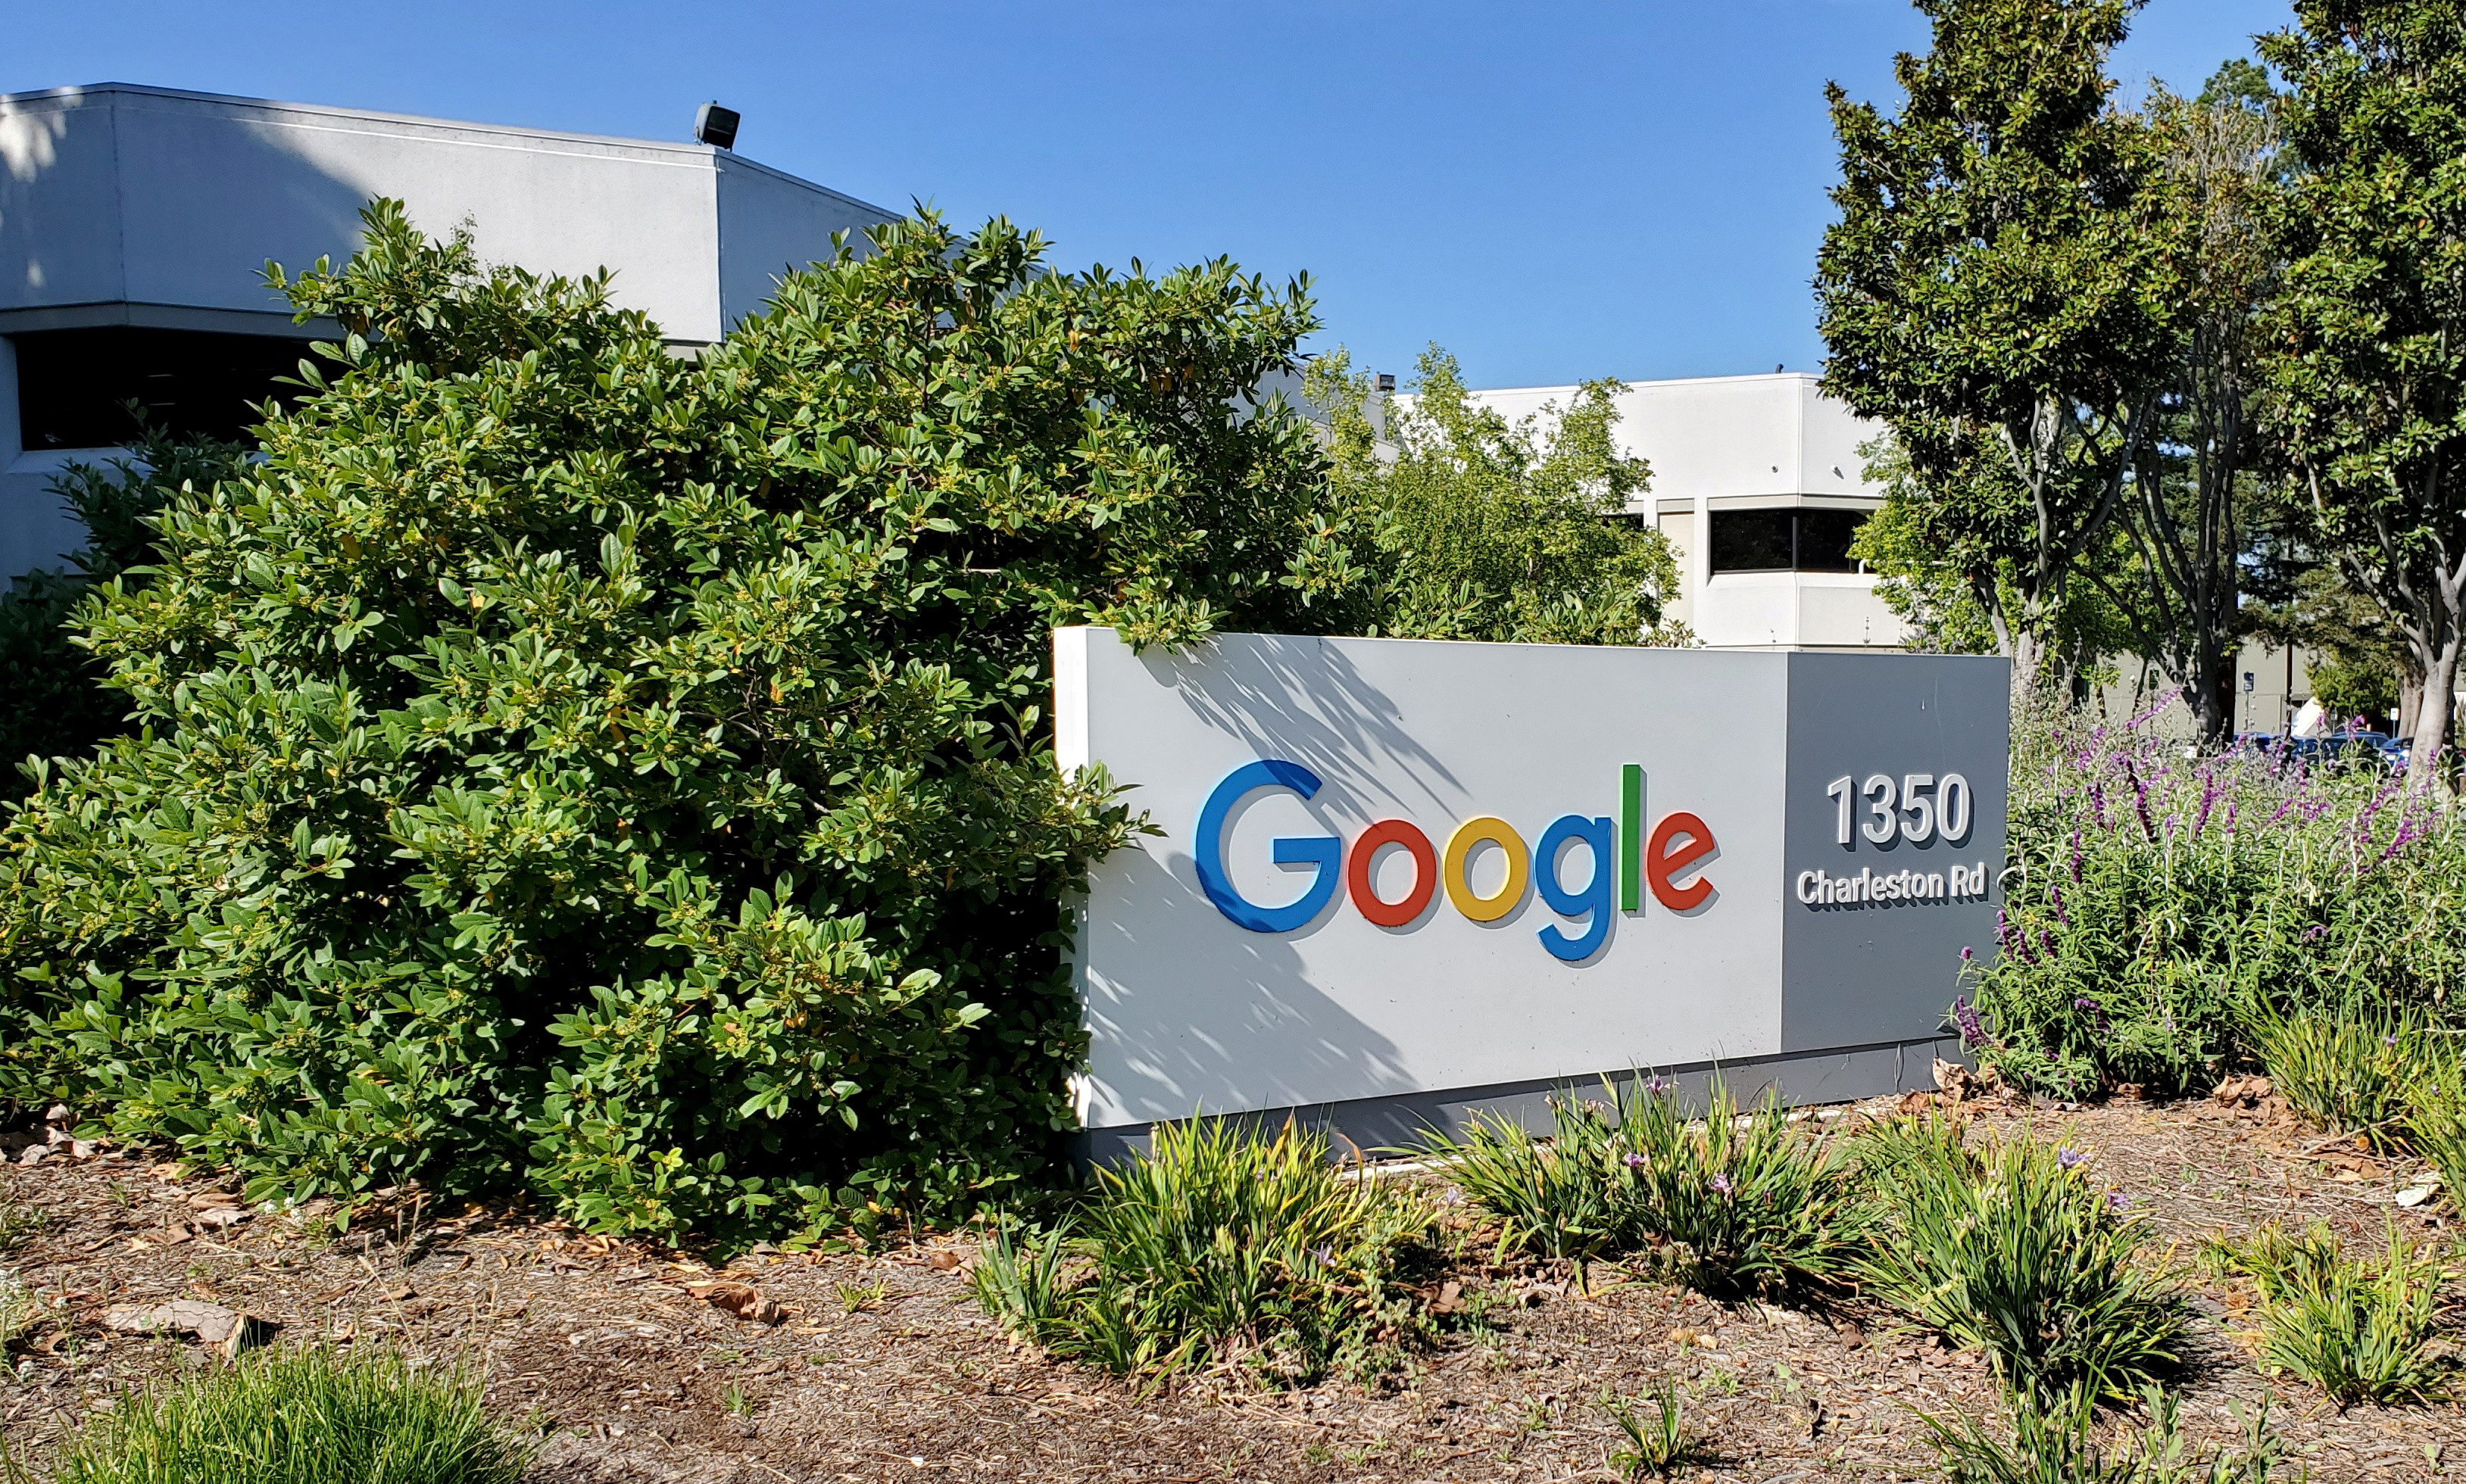 Google,谷歌,Facebook,臉書,媒體,新聞,澳洲,蘋果,新聞媒體,社群,網路平台,監管